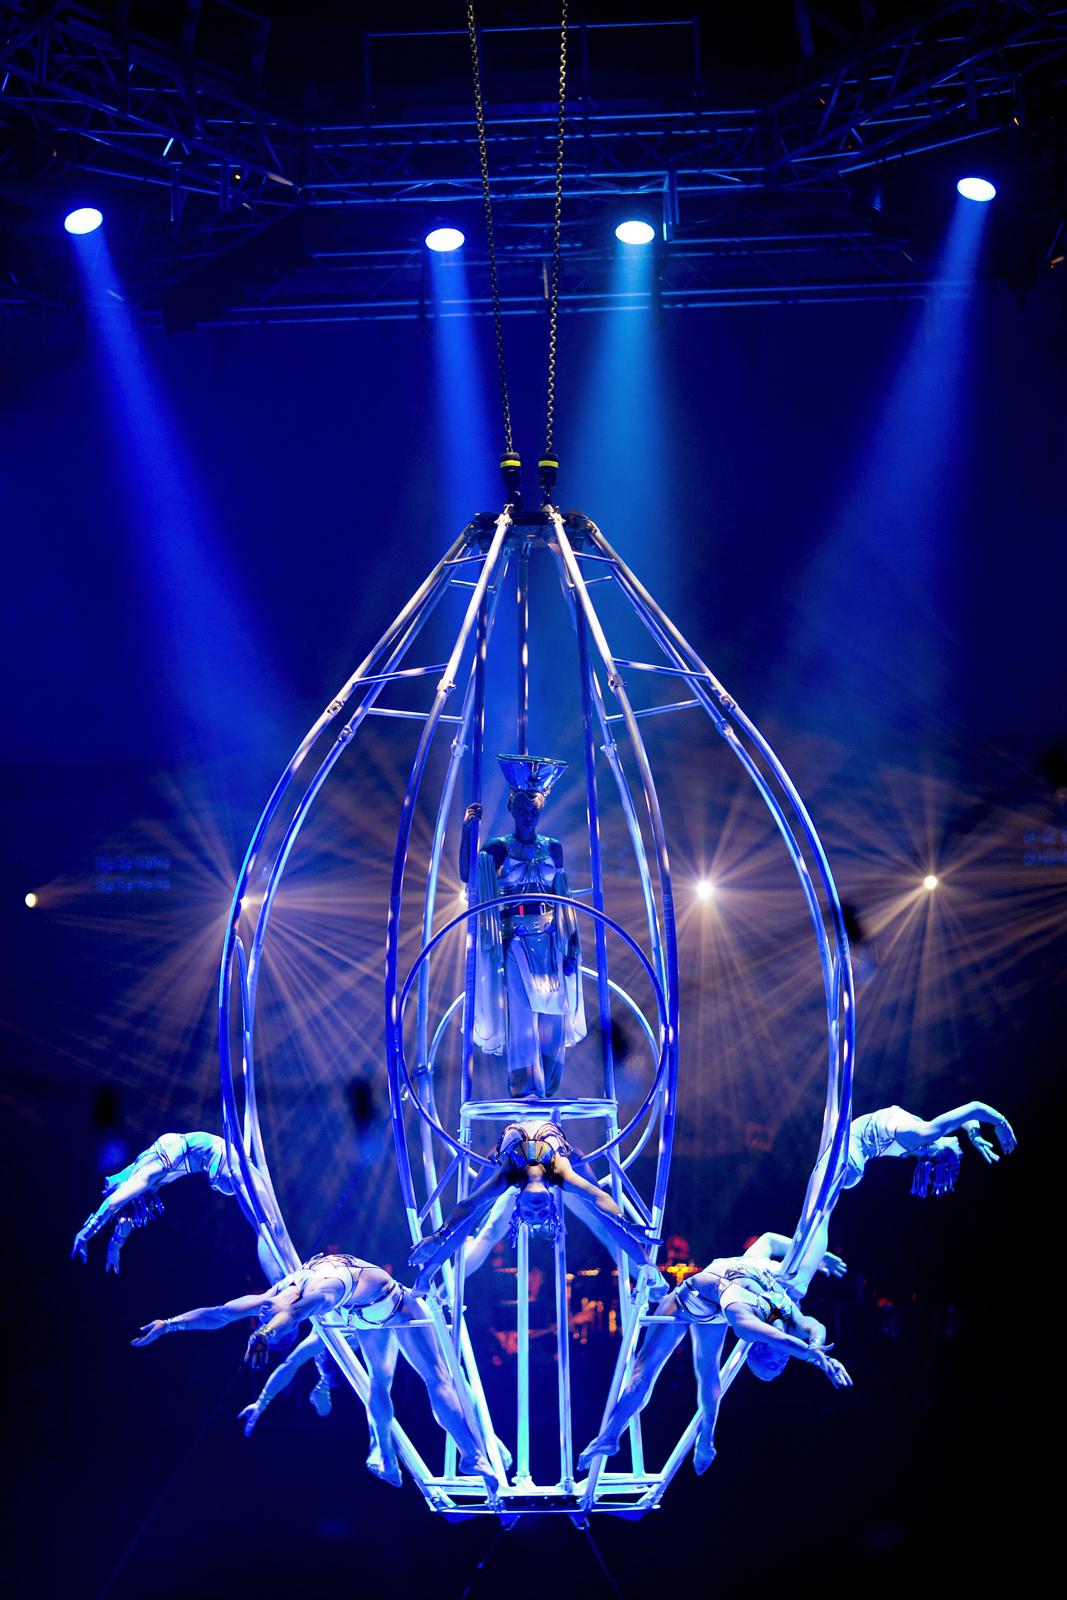 cie-les-farfadais-numero-hommage-posthume-a-icare-spectacle-quintessence-cirque-alexis-gruss-photo-karim-el-dib